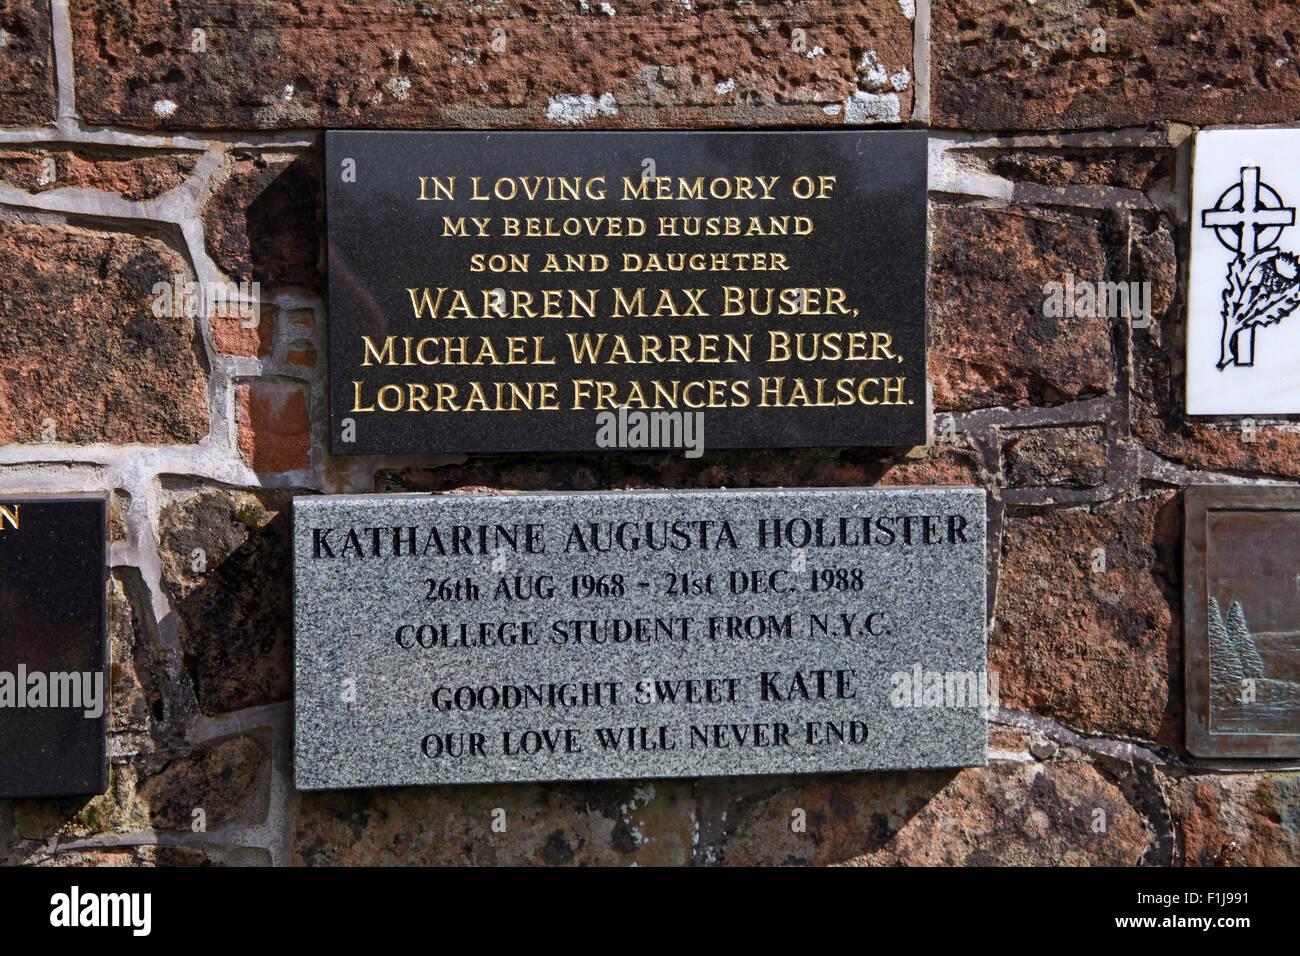 Lockerbie PanAm103 In Rememberance Memorial Warren Max Buser Michael Warren lorraine Frances Halsch Katherine Augusta - Stock Image